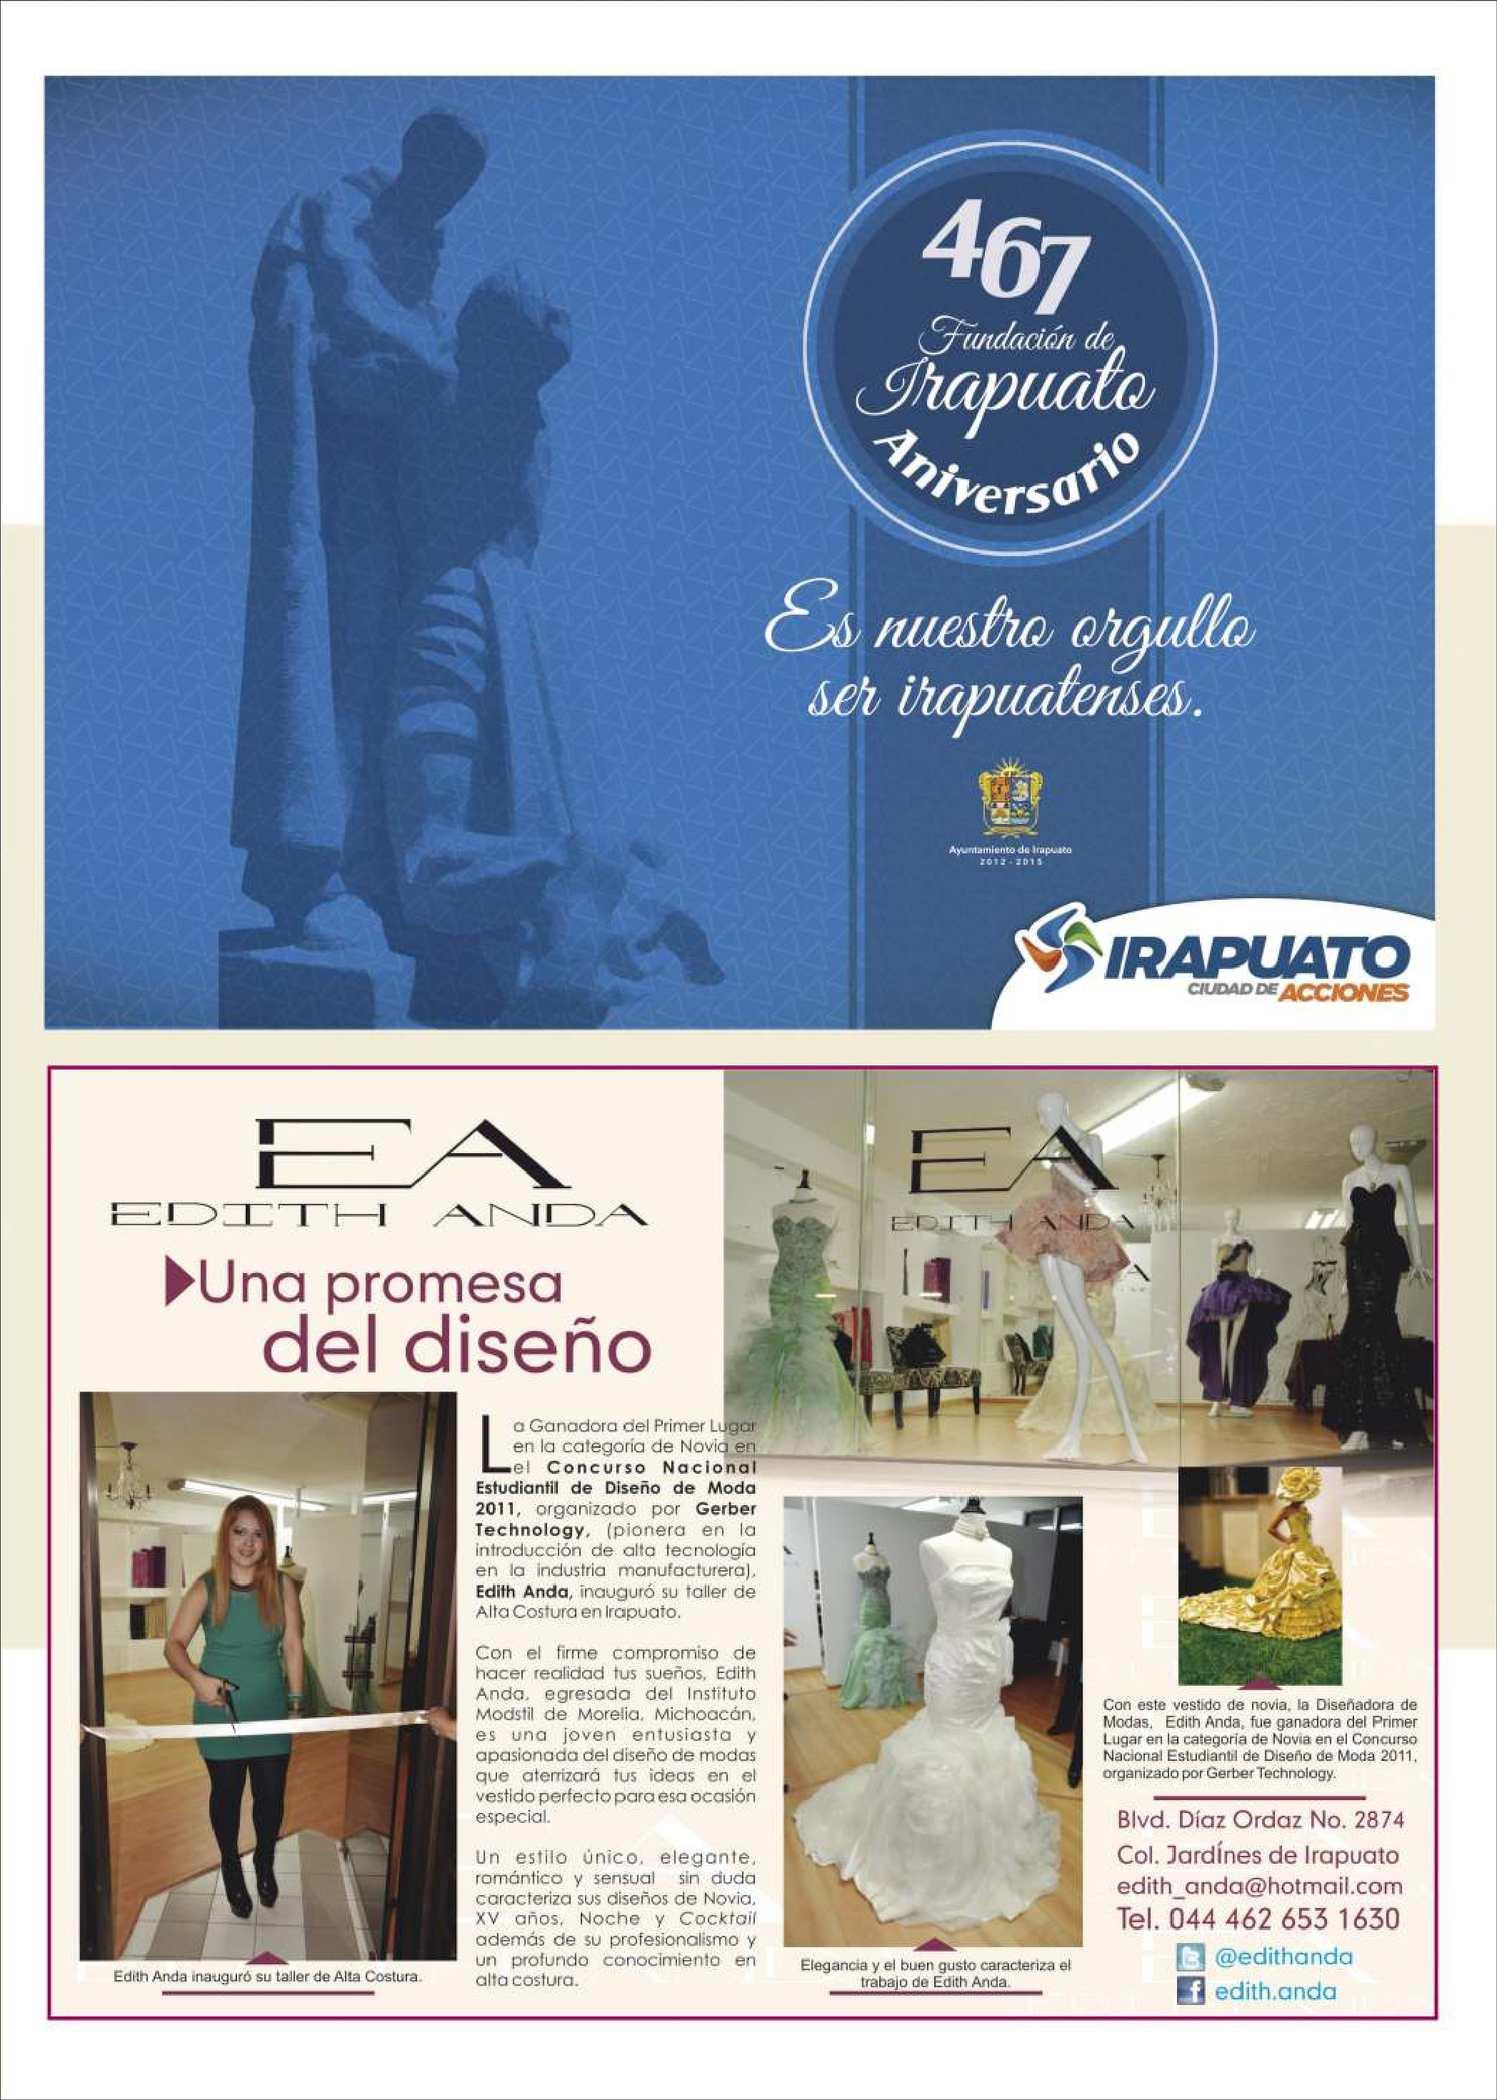 Élite Metropolitan Irapuato y Salamanca 462 - CALAMEO Downloader